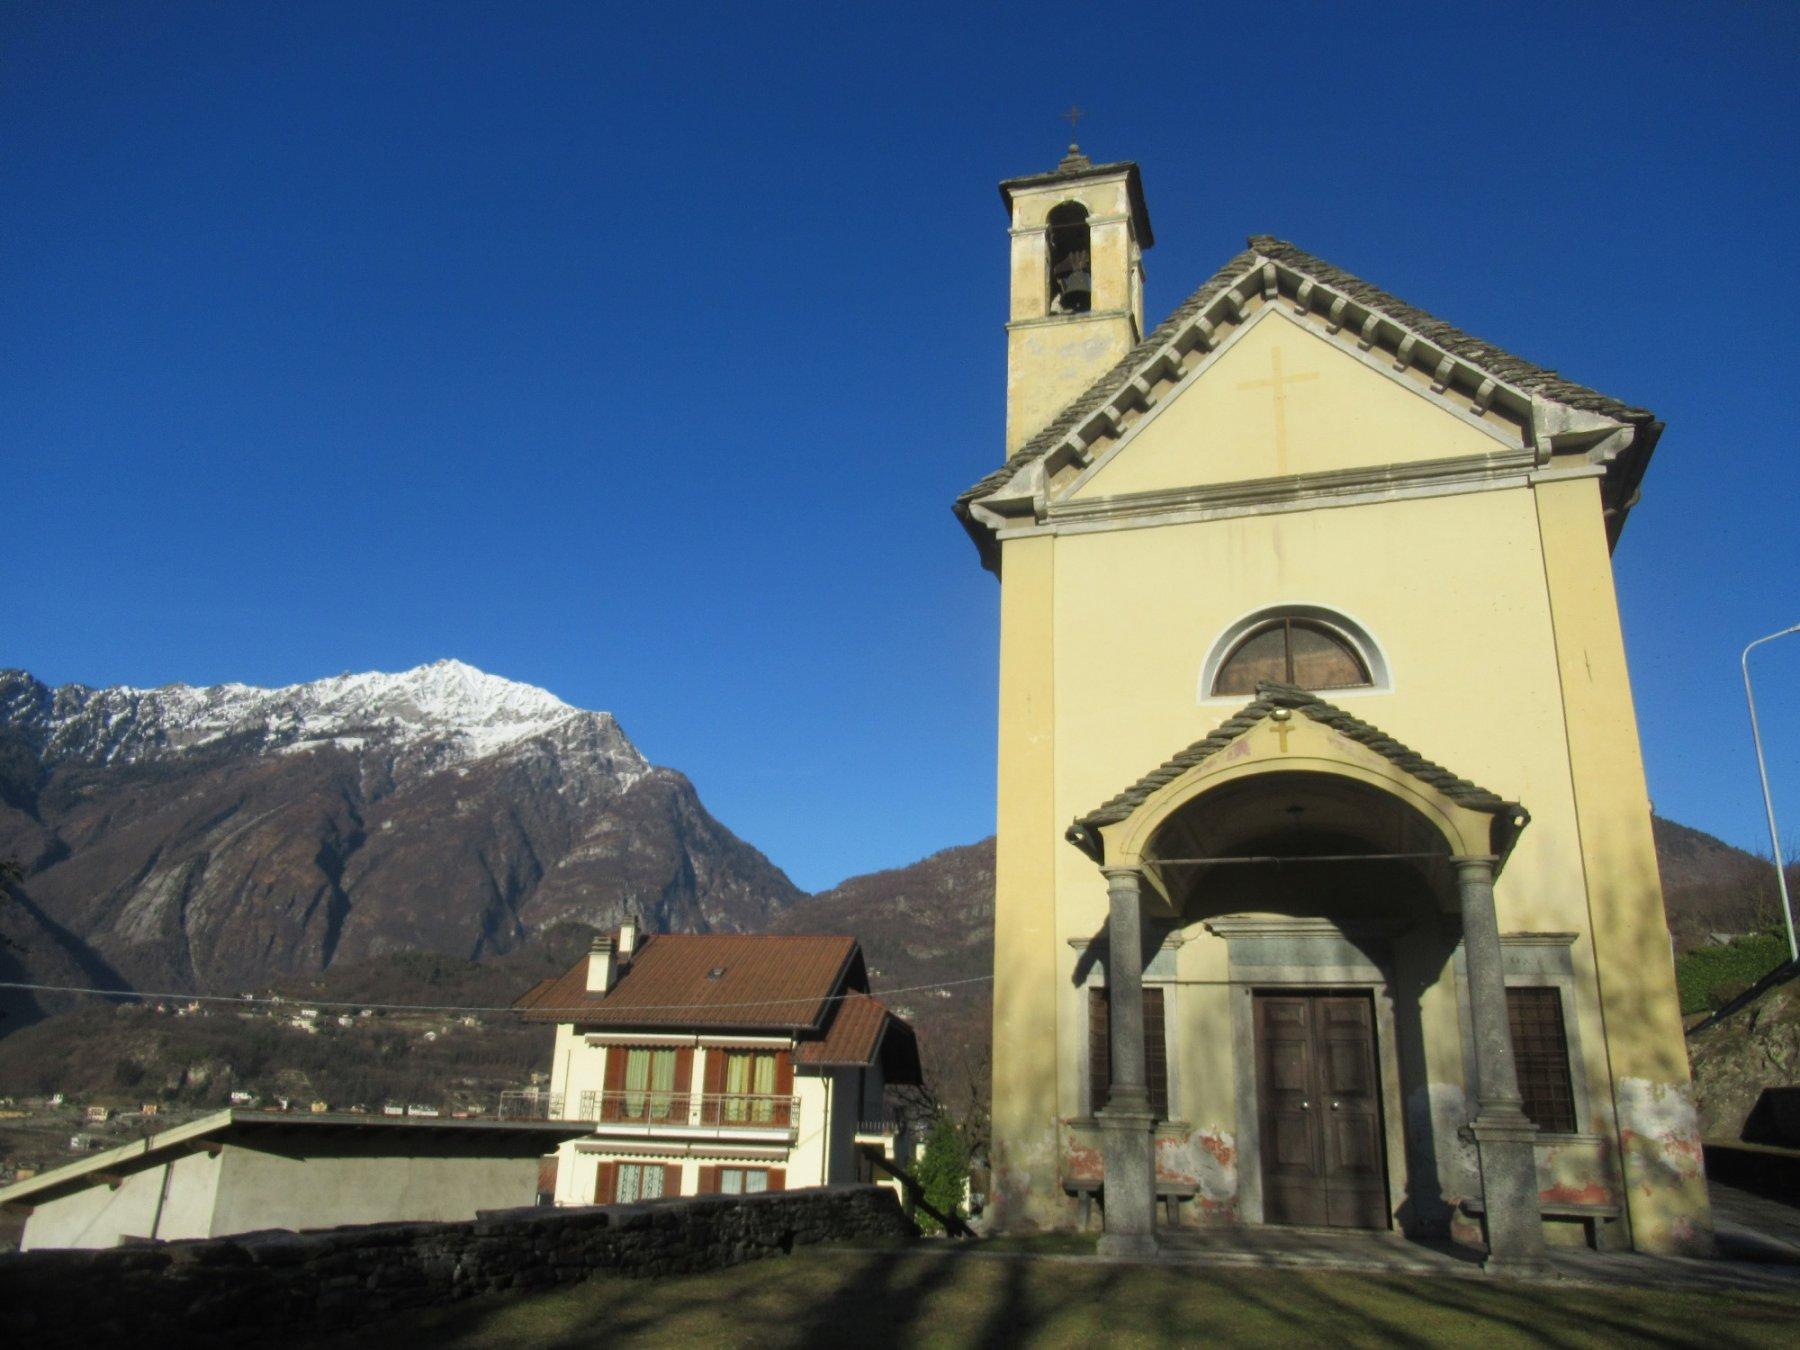 L'oratorio di San Giuseppe a Pontetto